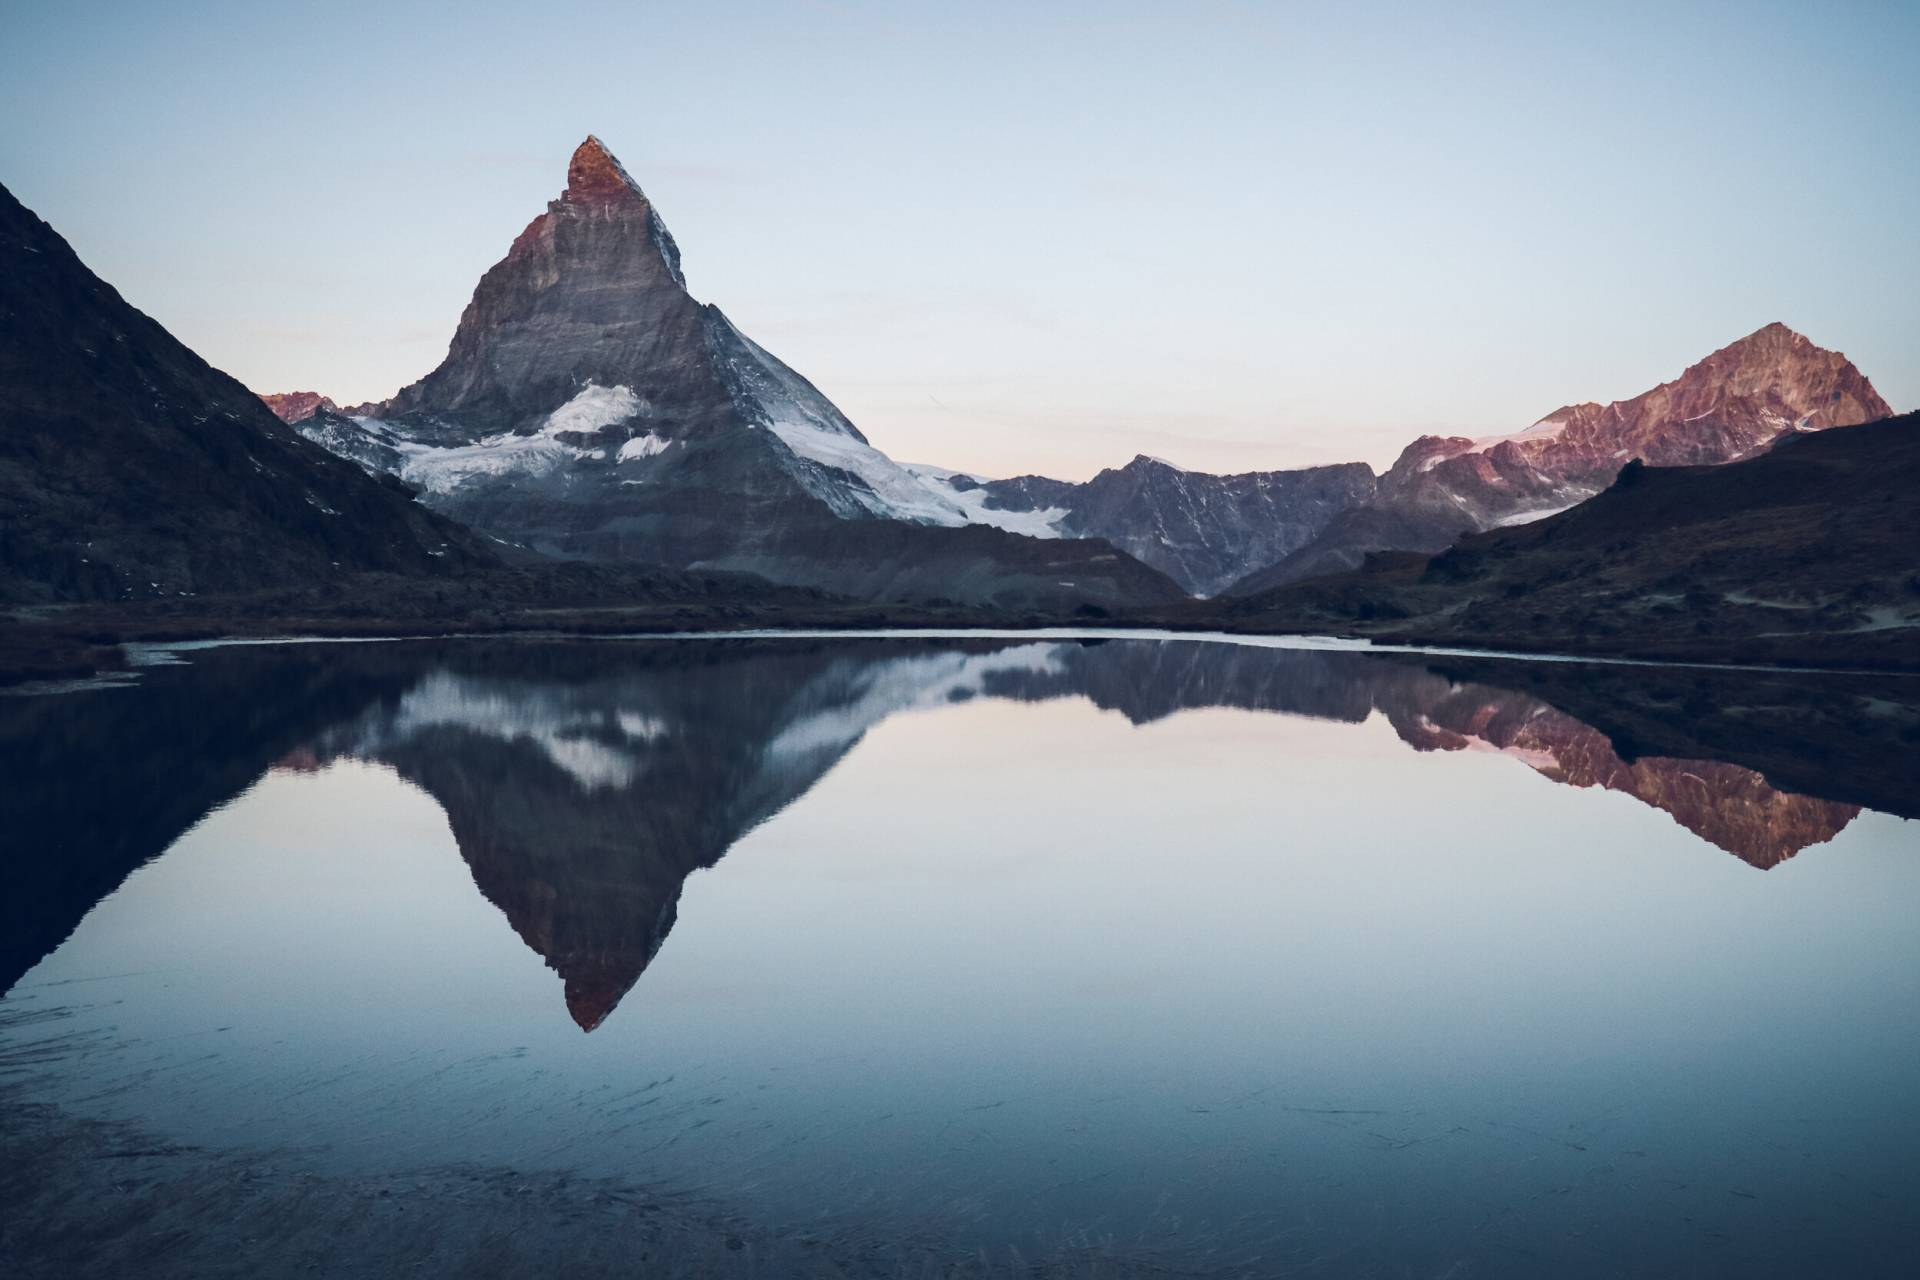 Sunrise at the Riffelsee lake above Zermatt, Switzerland